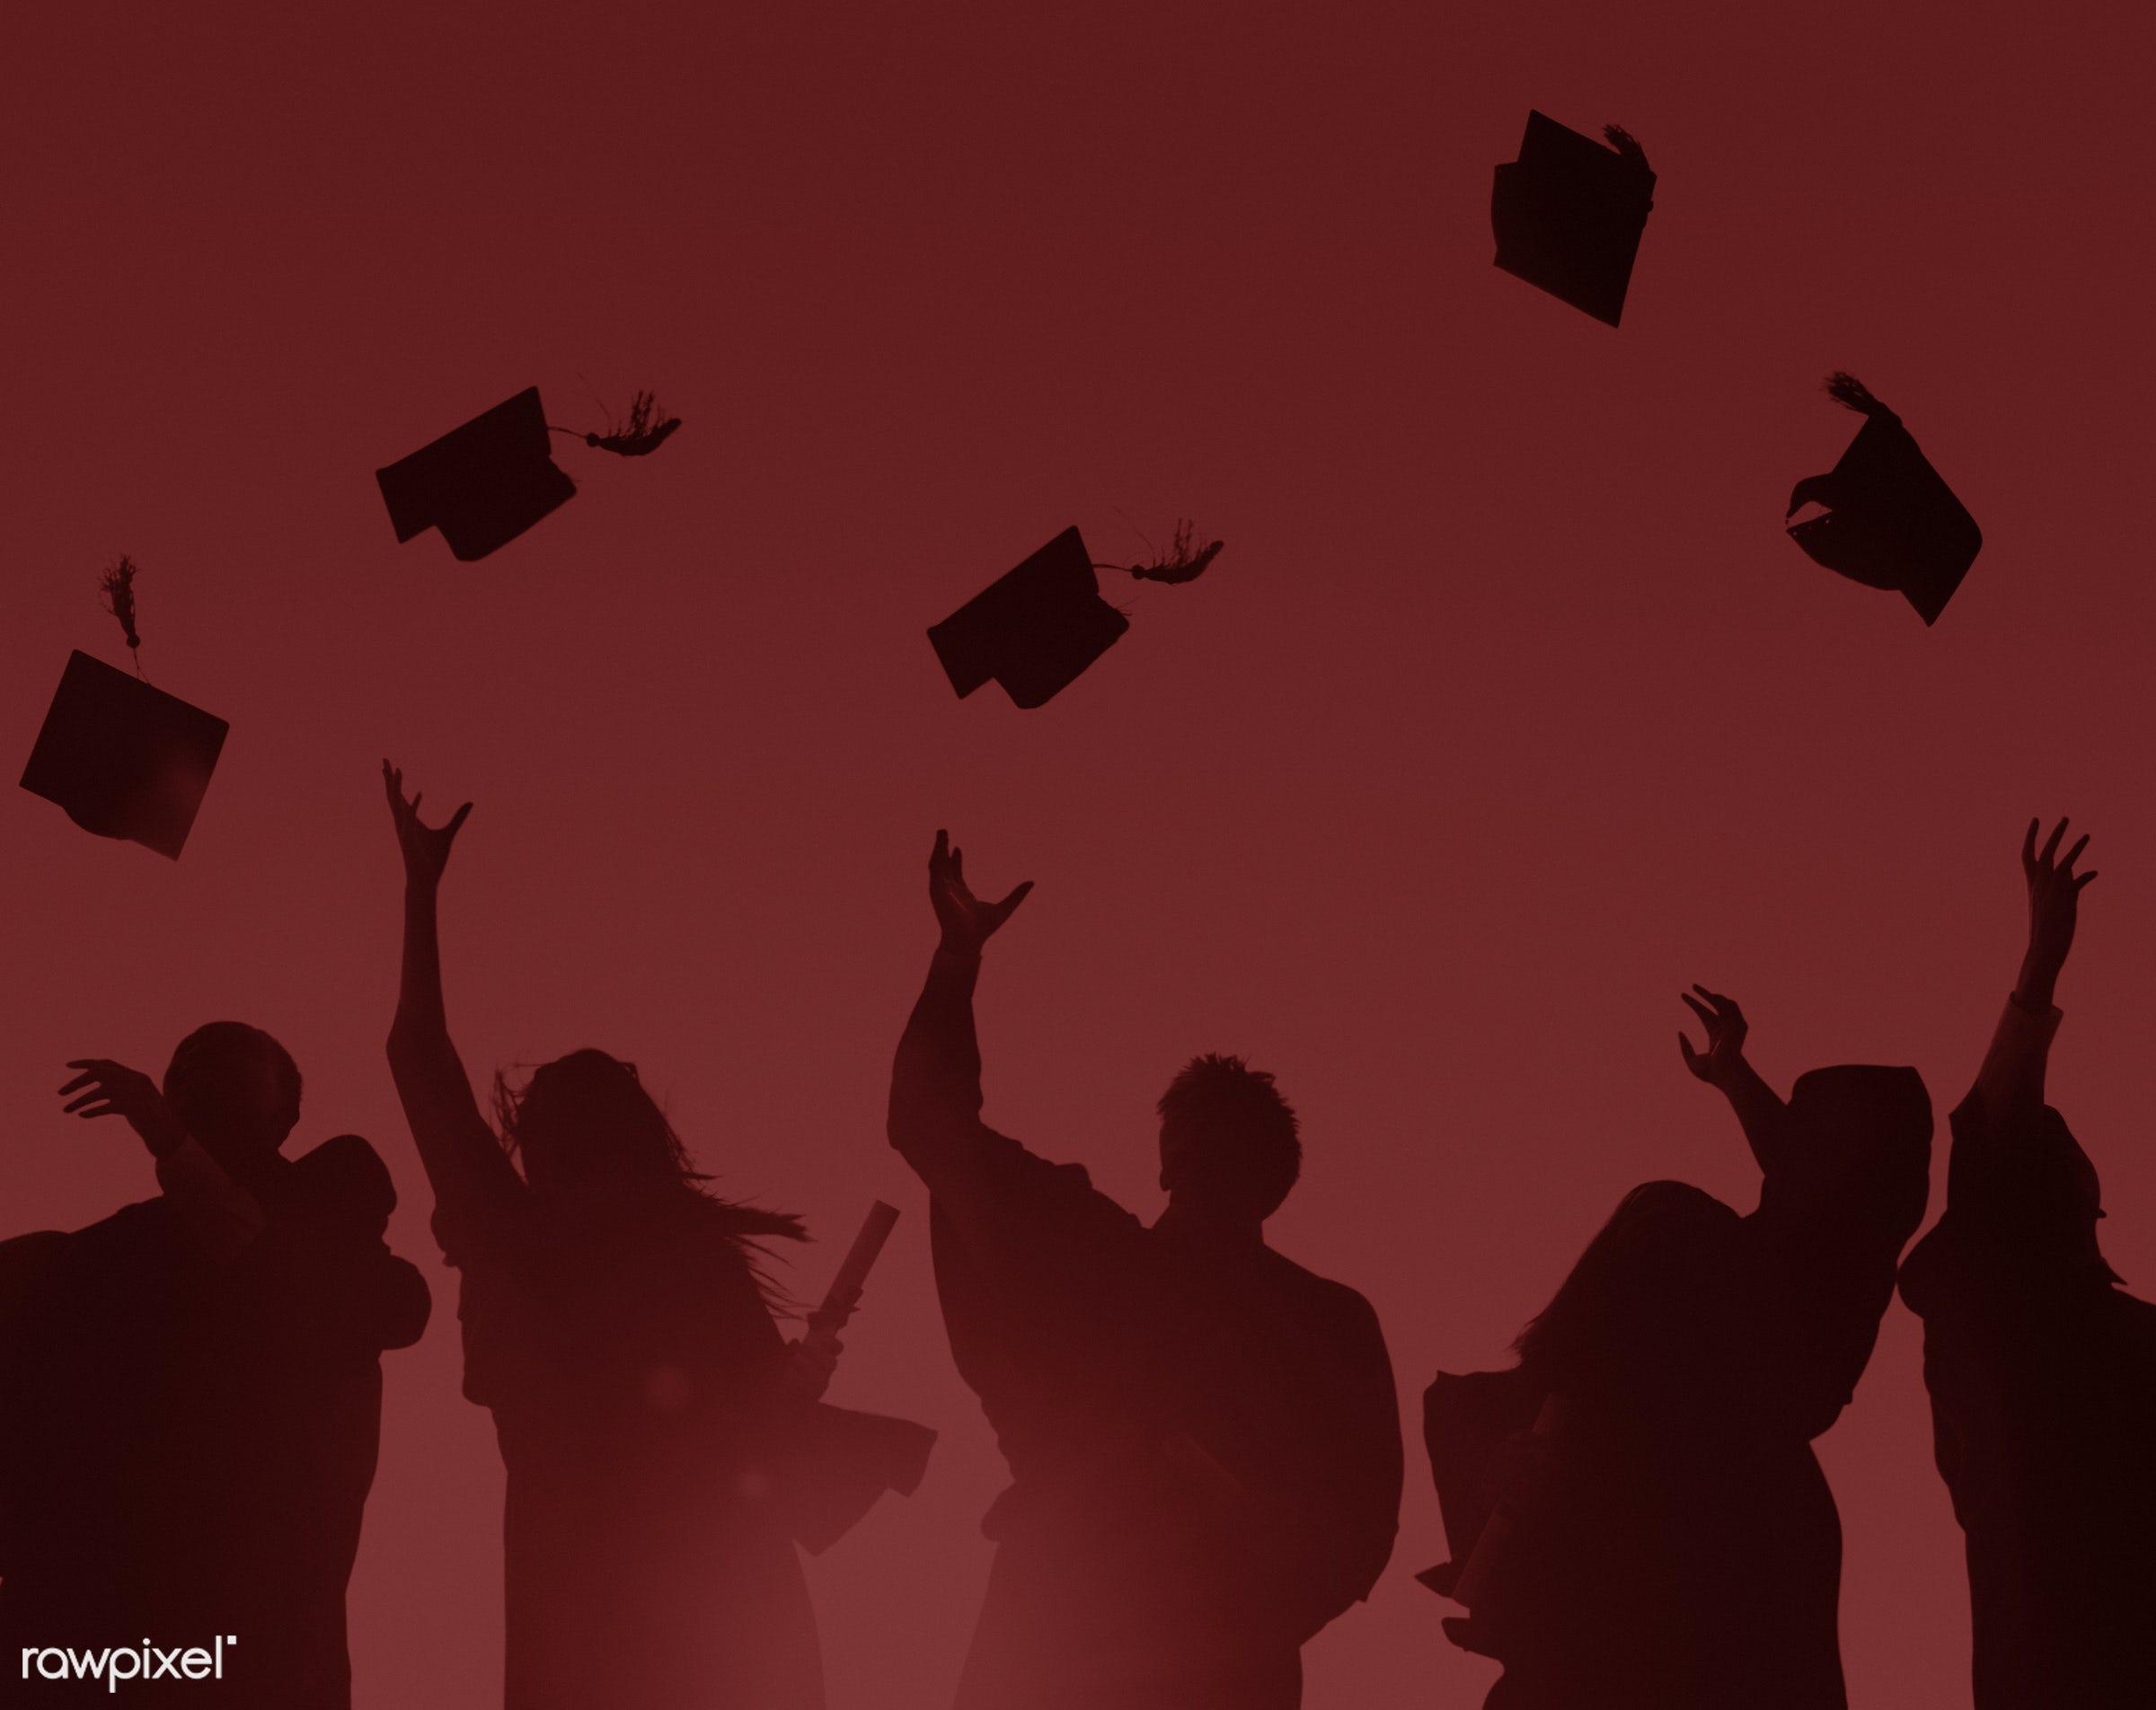 academic, achievement, campus, cap, celebration, ceremony, certificate, cheerful, college, college student, commencement,...